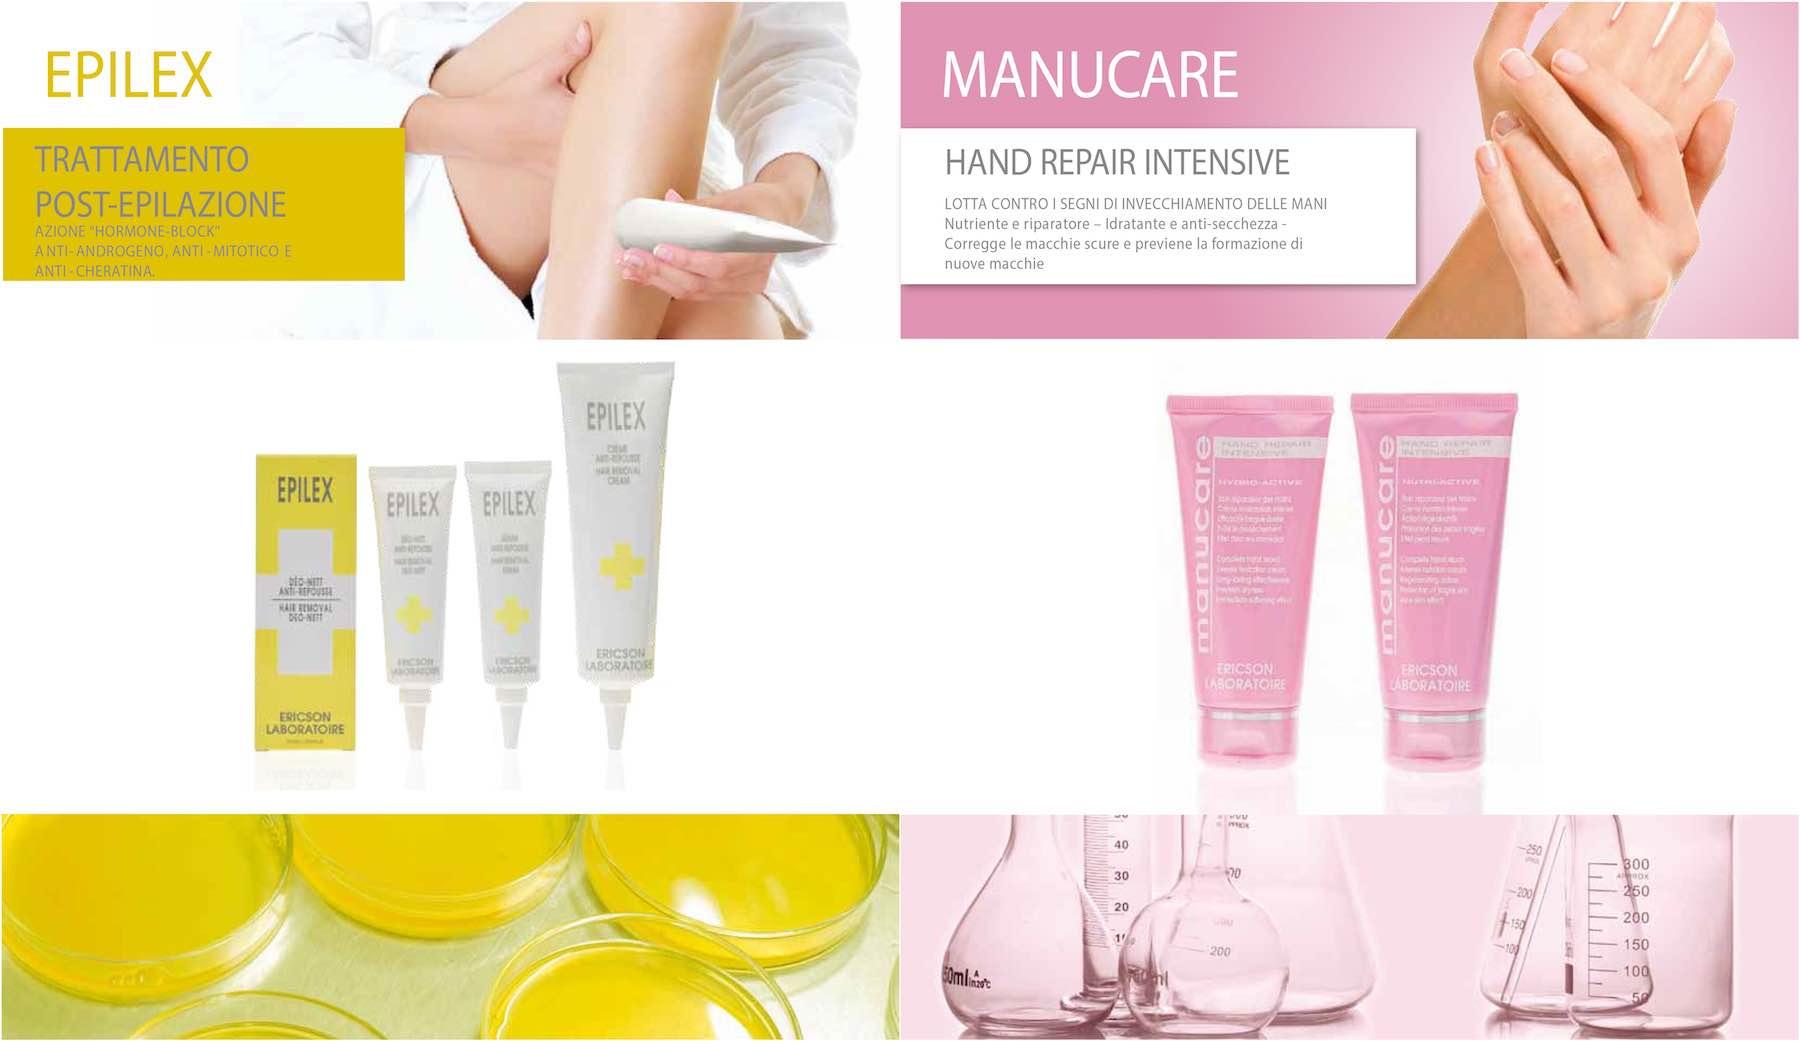 Jerà Beauty - Body - Ericson - Laboratoire-epilex & manucolare